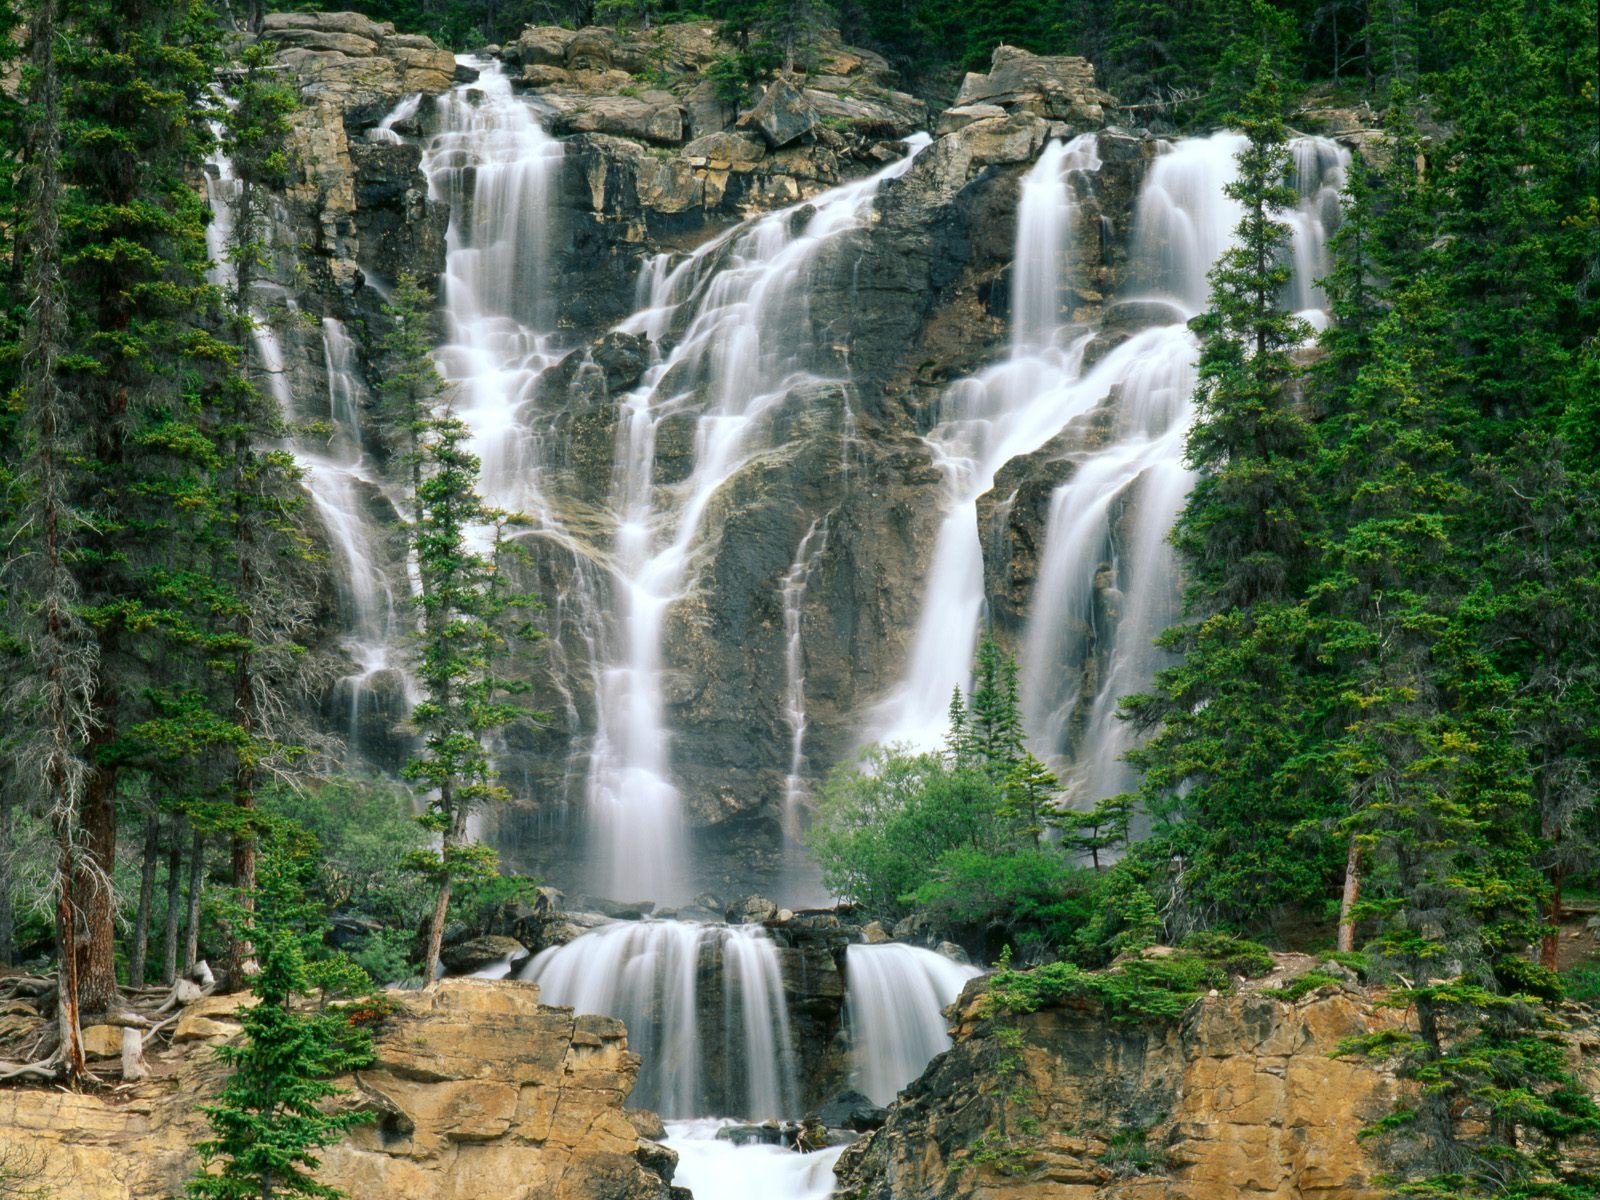 Mzukowski with keywords: jasper national park, athabasca falls